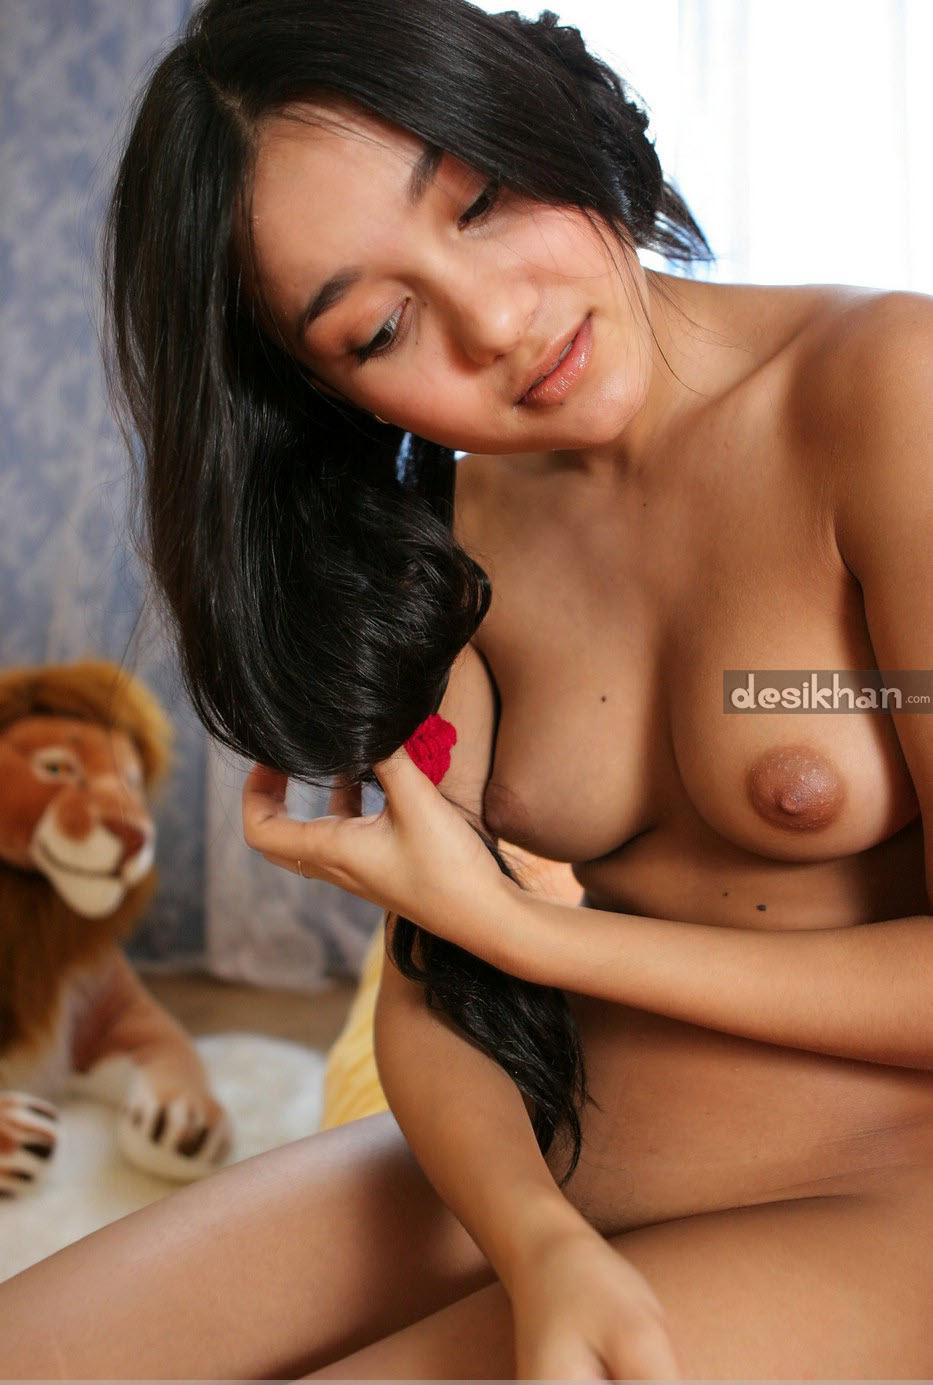 Sexy Girl Friend Lissa Seducing In Bed Nude Pics indianudesi.com